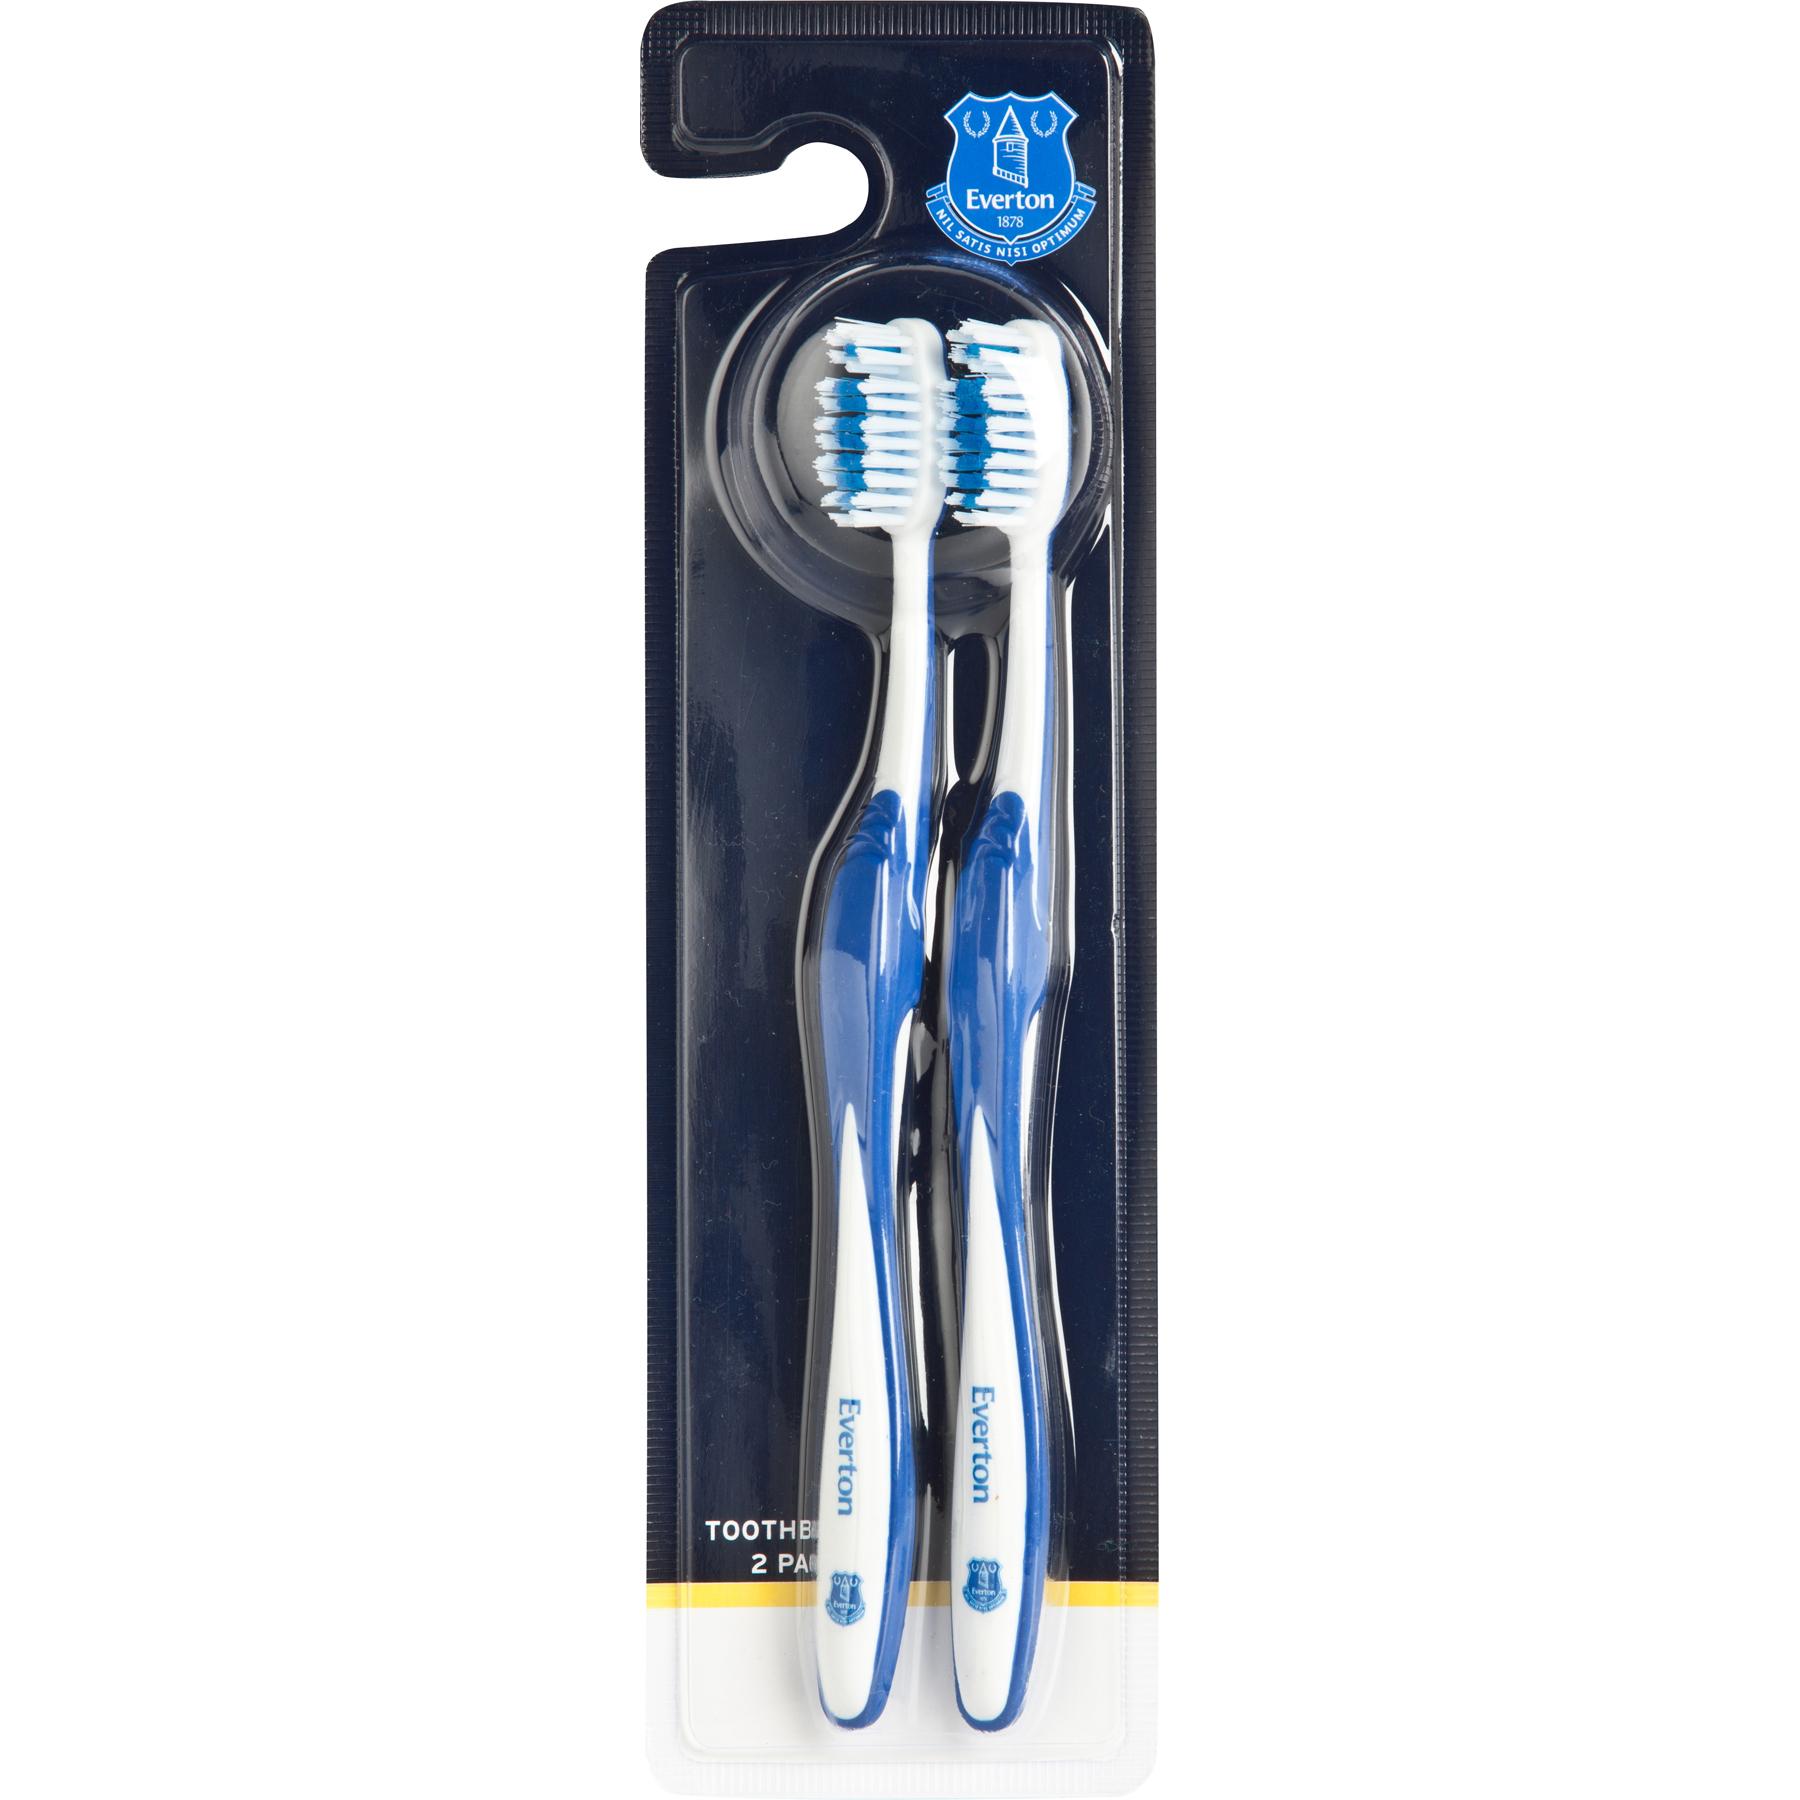 Everton Twin Pack Toothbrush